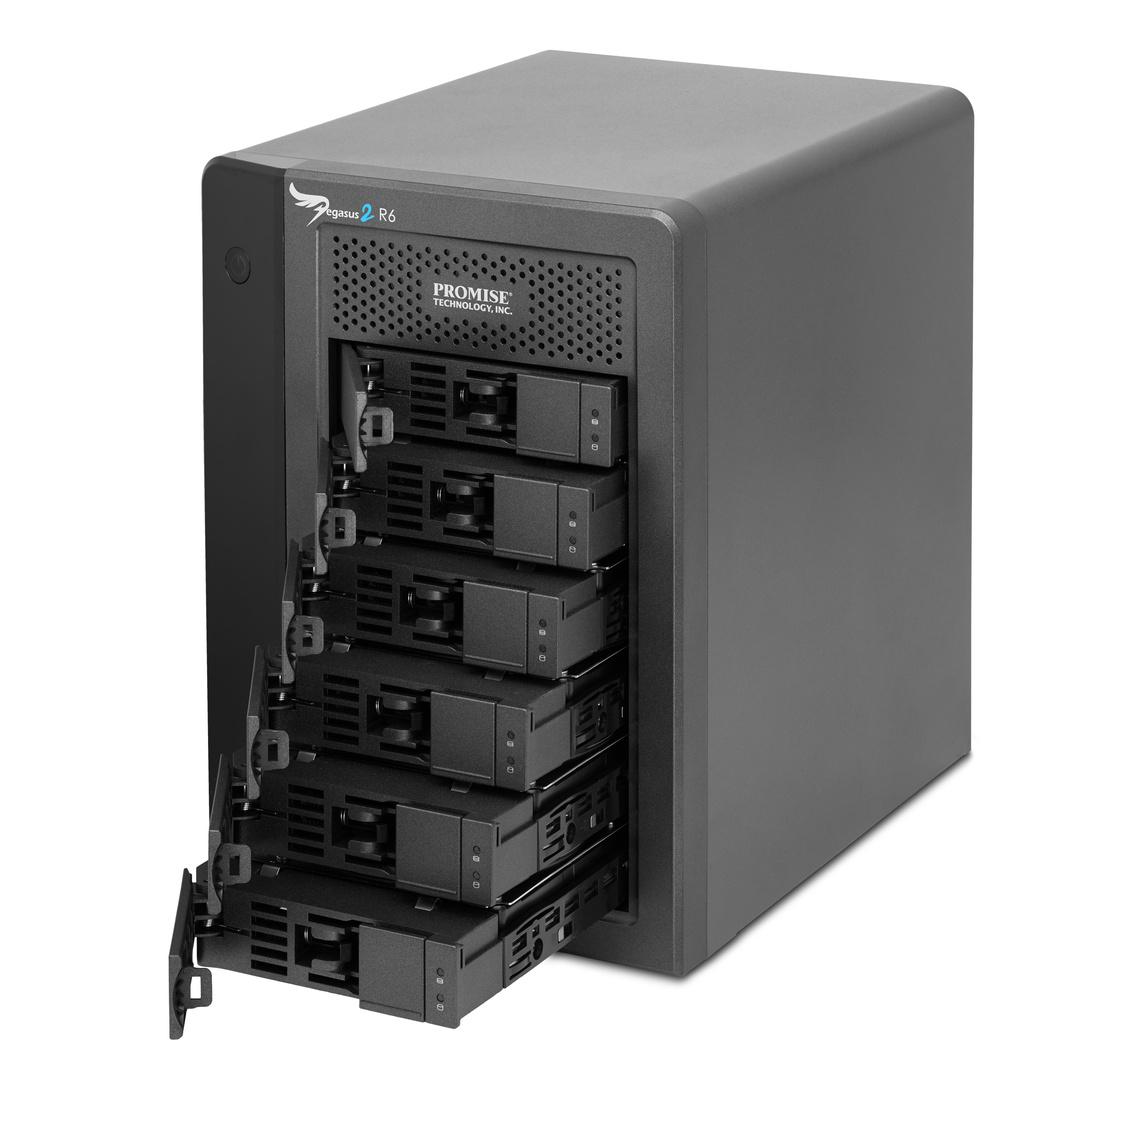 PROMISE Pegasus2 R6 18TB (6 x 3TB) Thunderbolt 2 RAID System